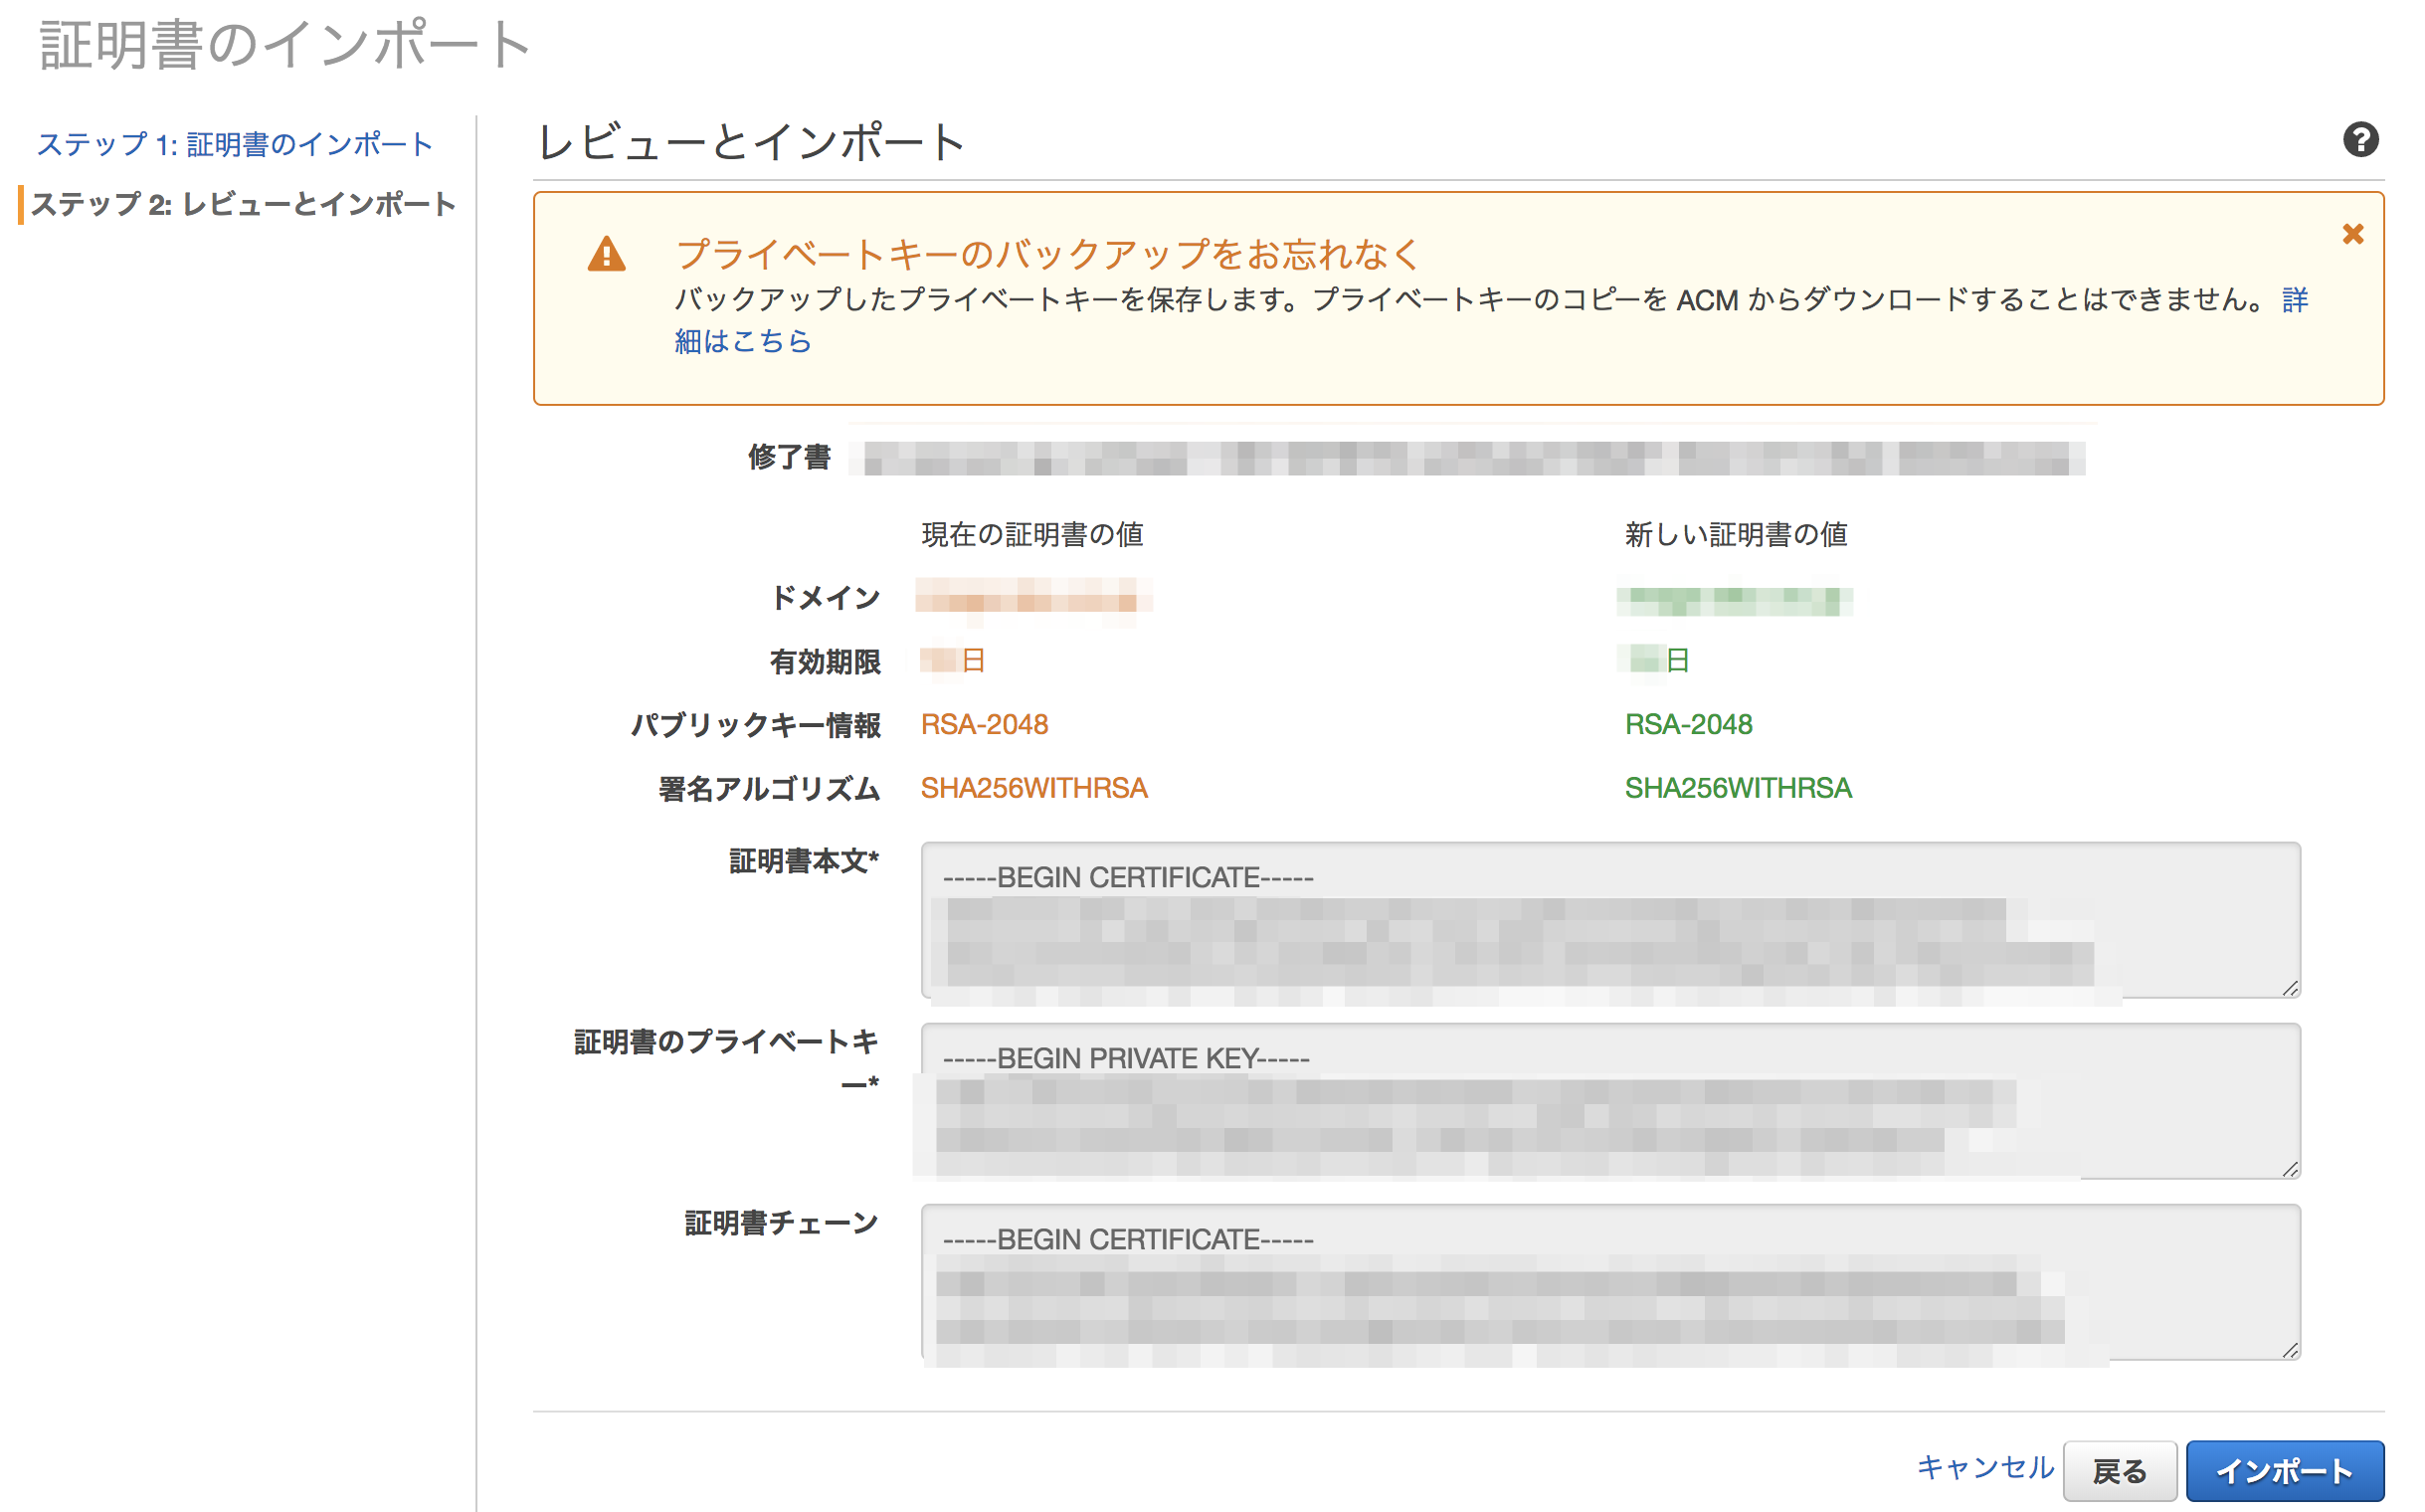 aws certificate manager acm にインポートしたssl tls証明書の更新方法